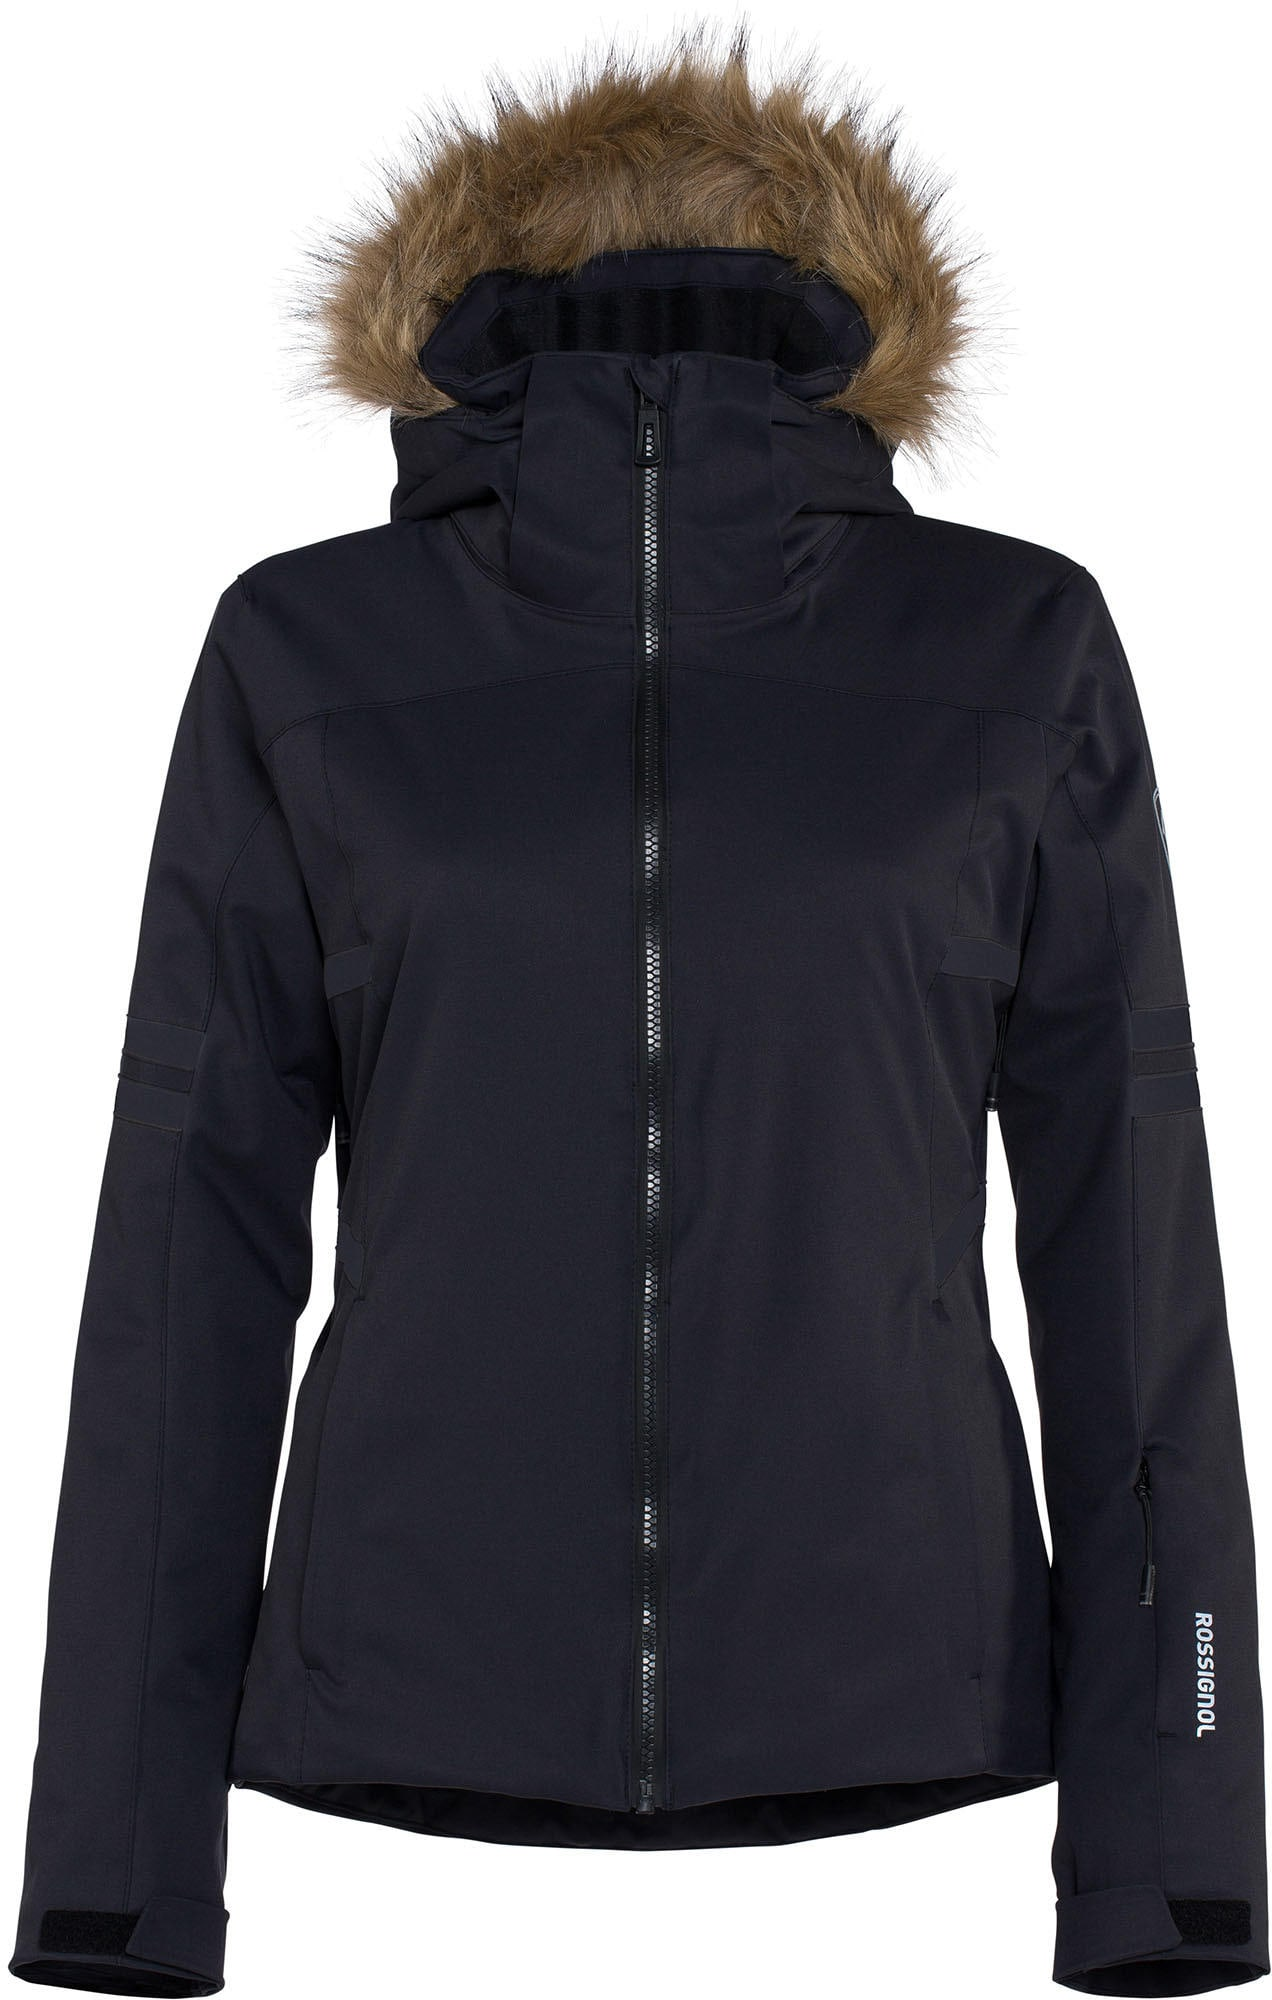 Rossignol Controle Ski Jacket - Womens 2018